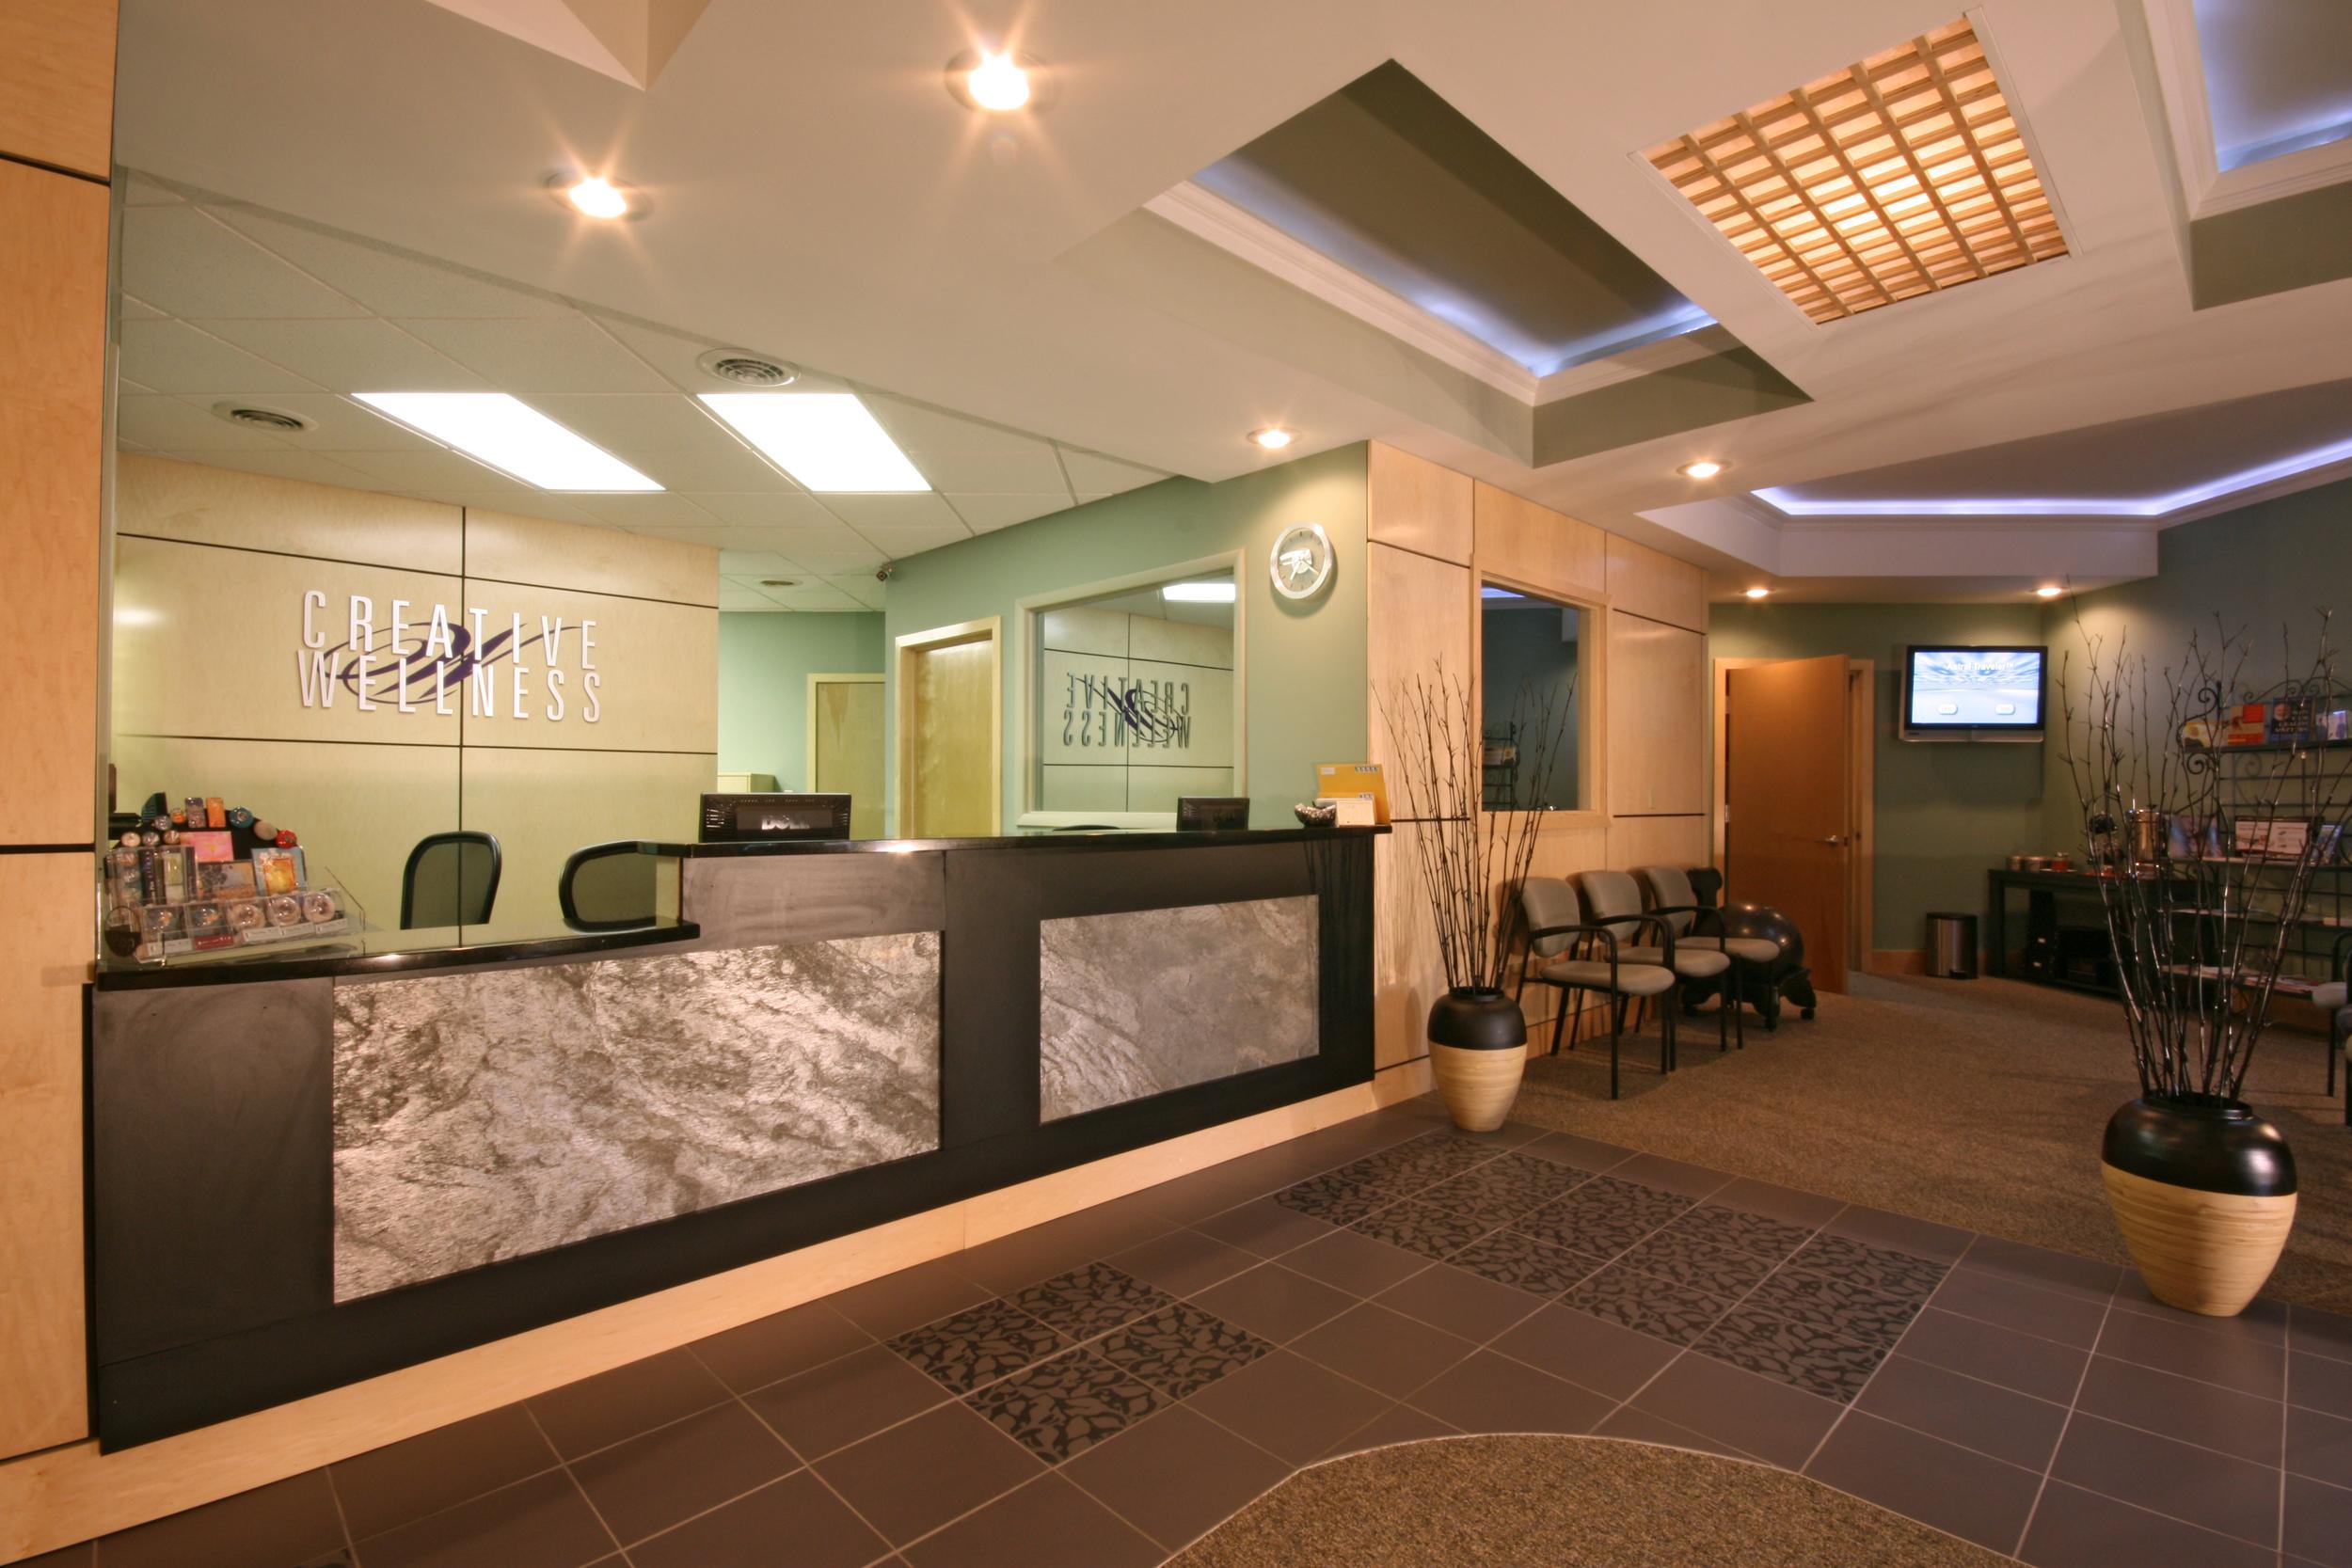 Creative Wellness Holistic Health Center- East Lansing, MI